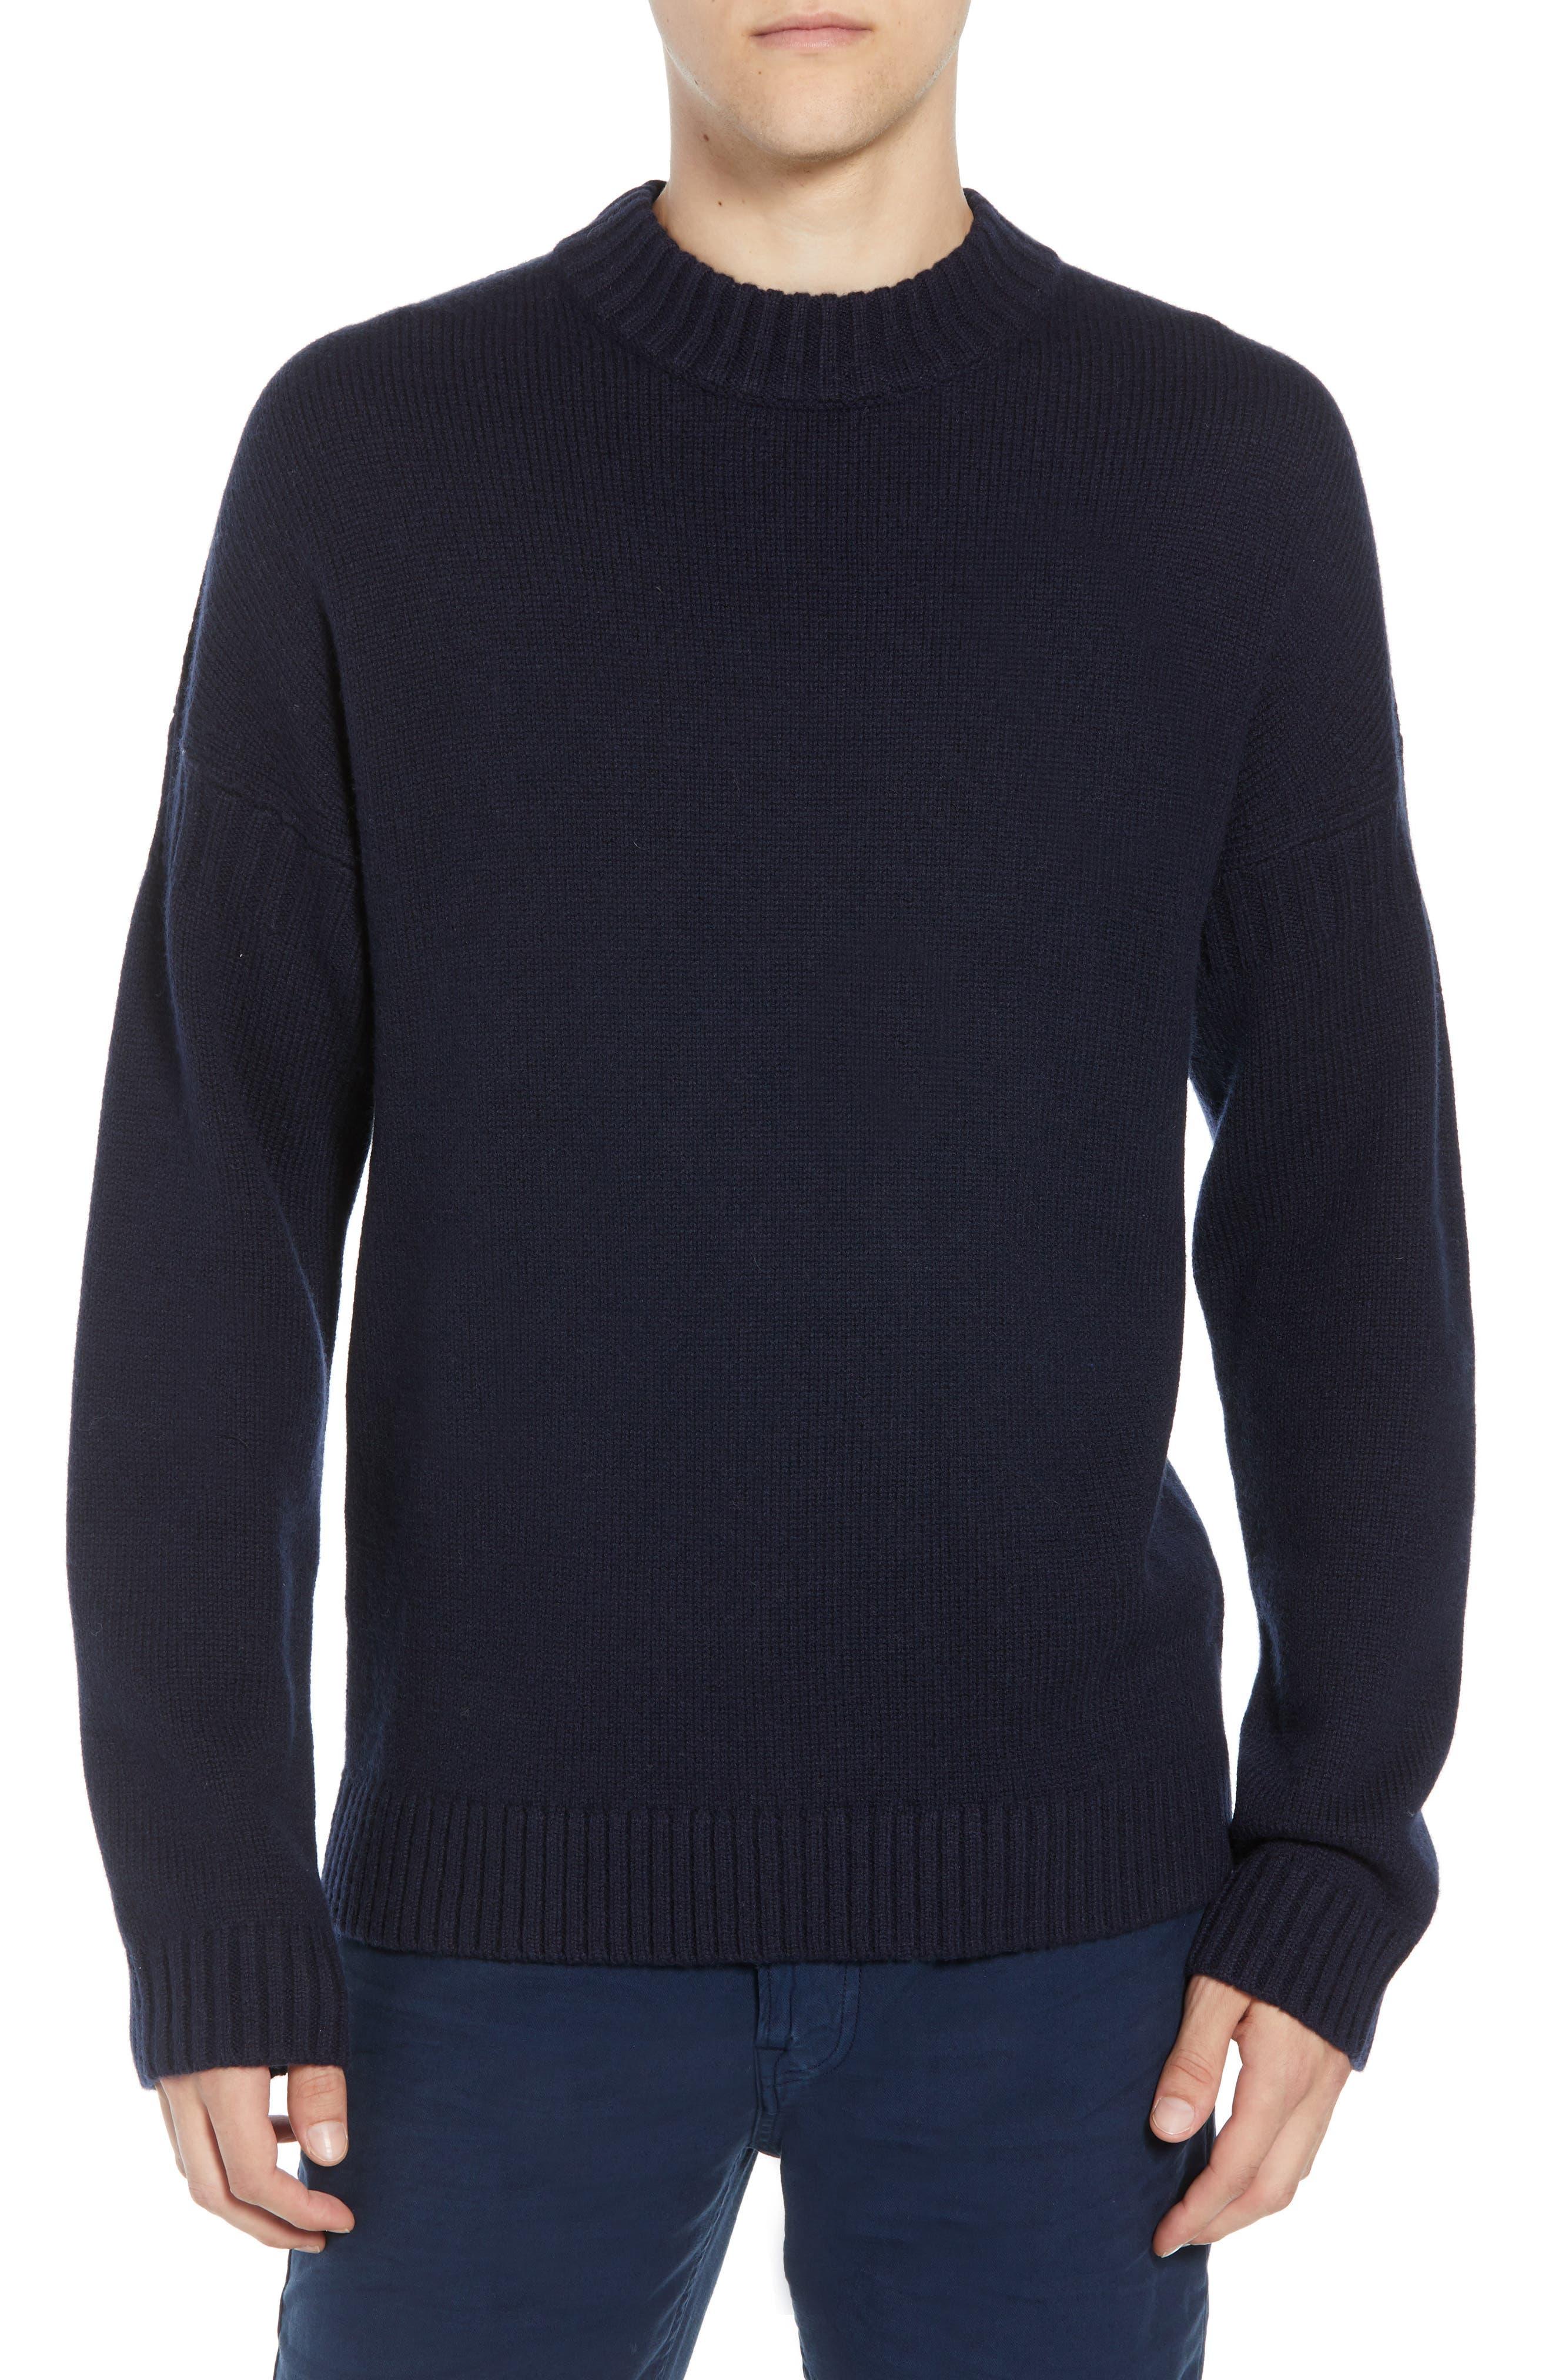 Fisherman Wool Blend Crewneck Sweater,                             Main thumbnail 1, color,                             UTILITY BLUE